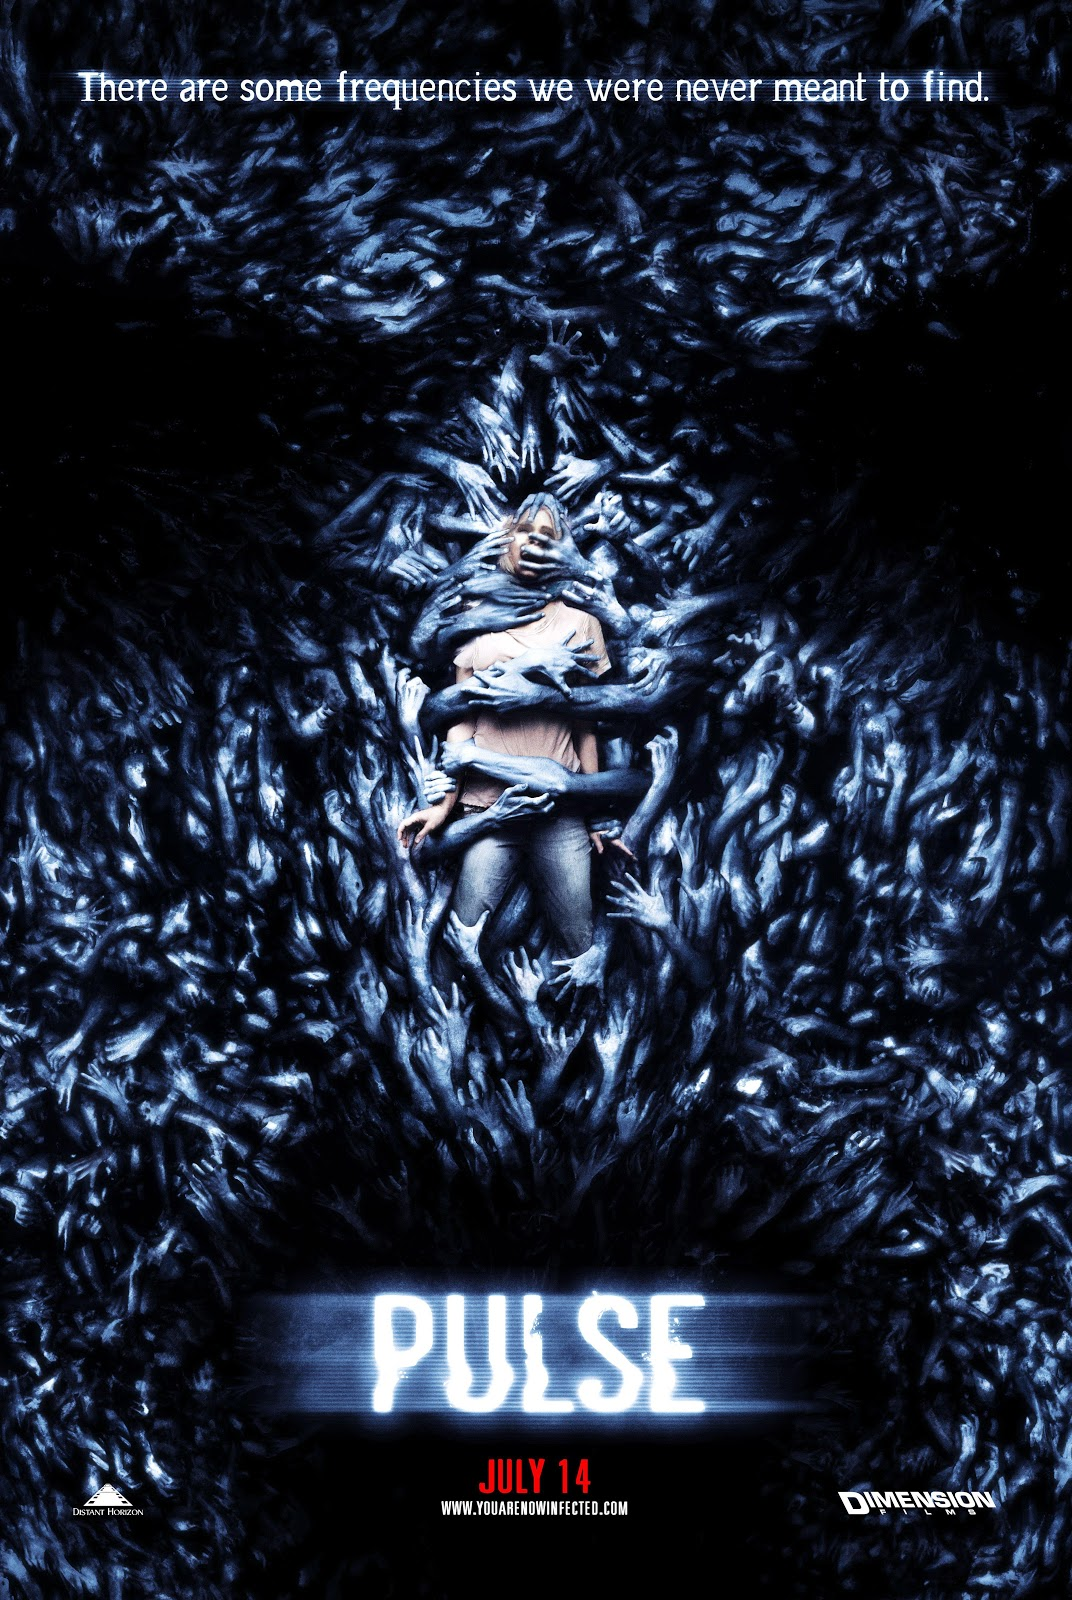 http://3.bp.blogspot.com/-WqdRRga2UVQ/ULEzFmMrAvI/AAAAAAAAELU/_eqX6WxYBBU/s1600/Pulse+(2006)+Movie+Poster.jpg